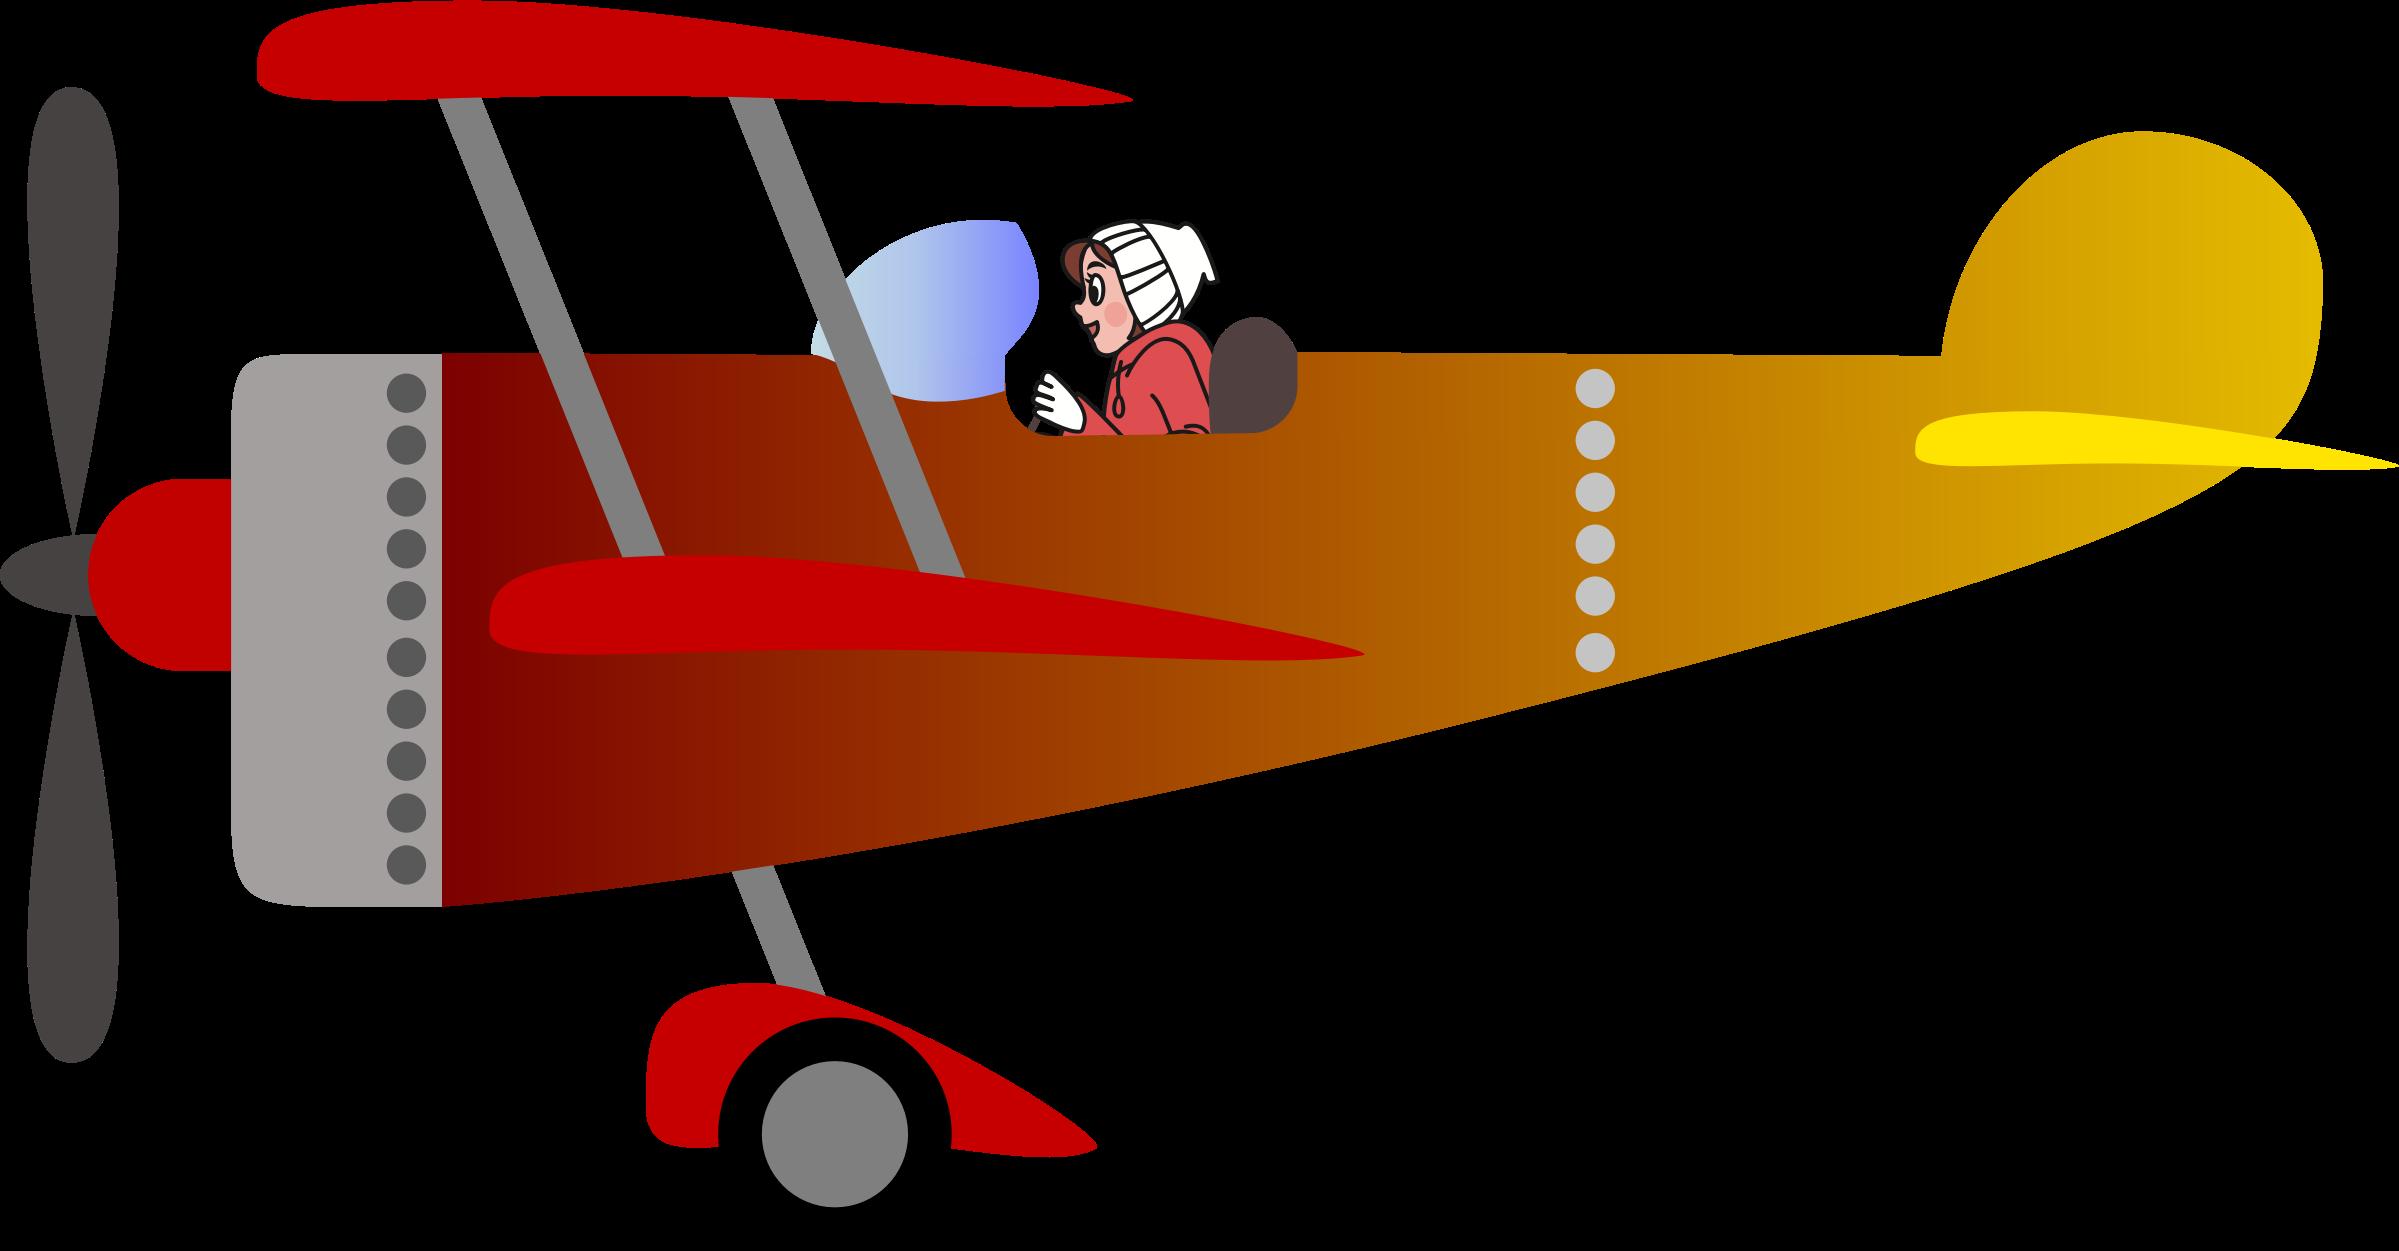 Pilot clipart girl pilot. Biplane with a woman